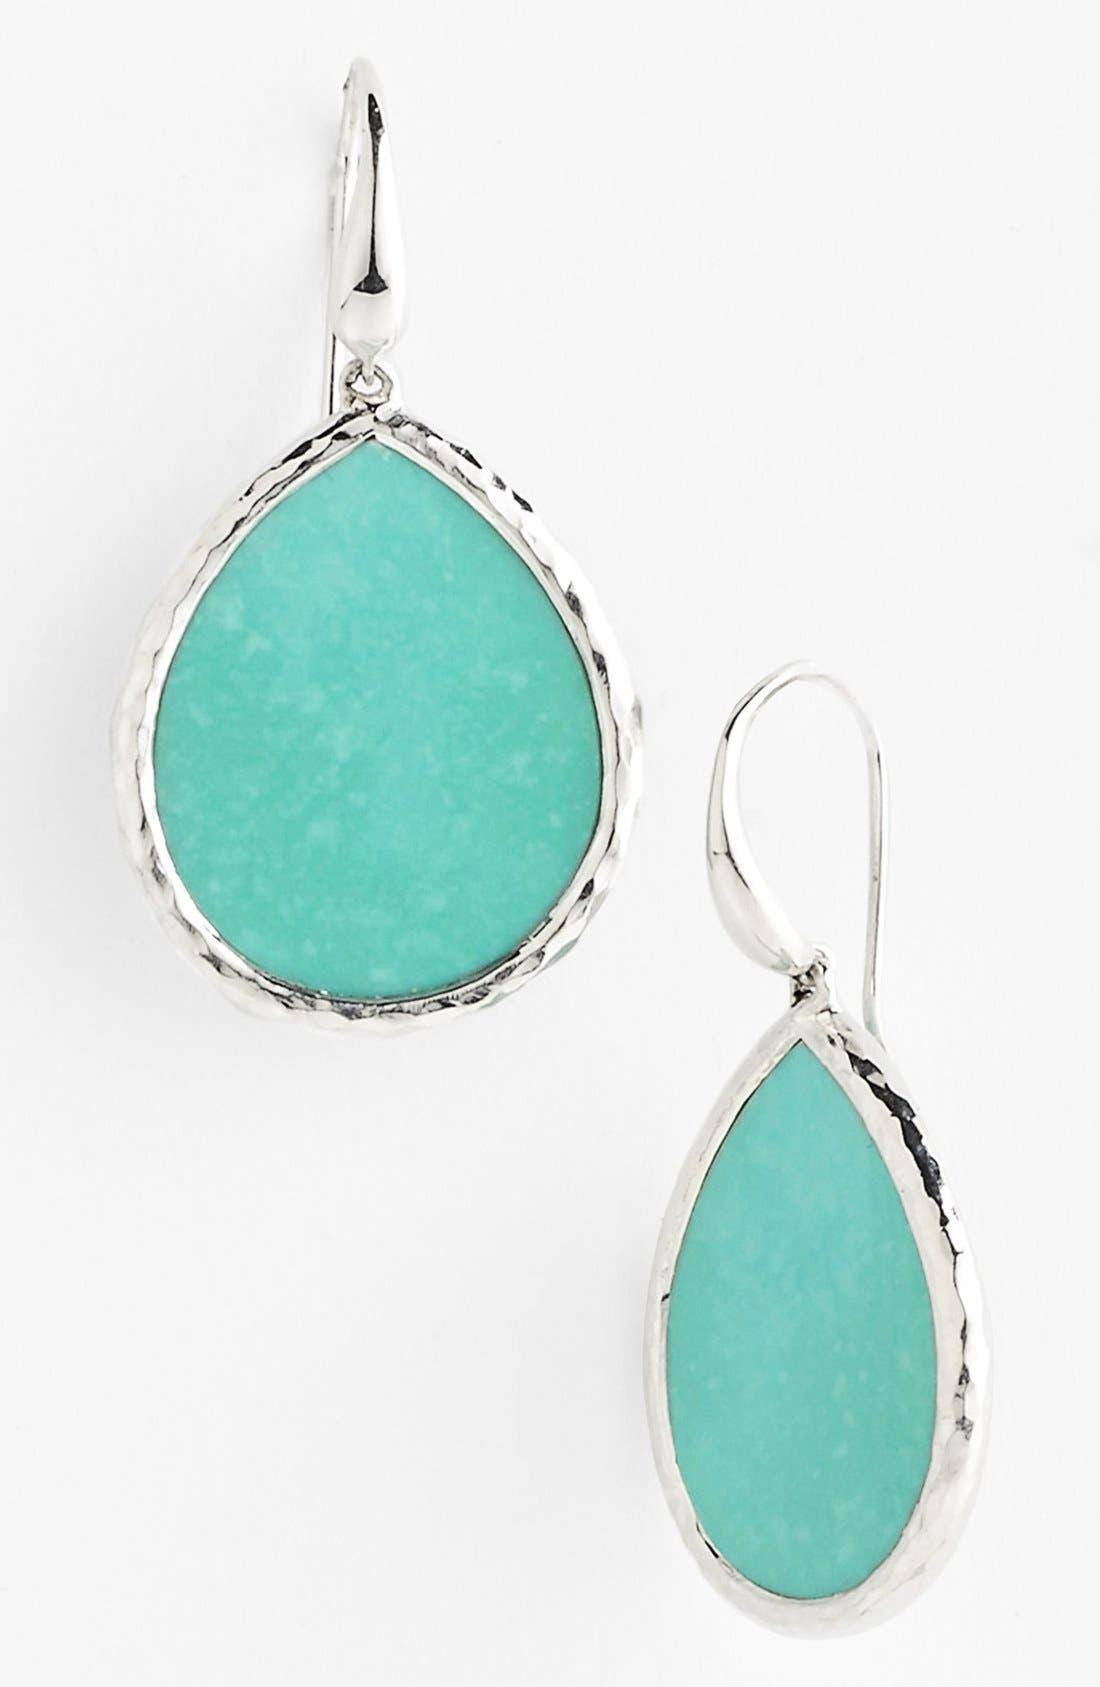 Alternate Image 1 Selected - Ippolita 'Rock Candy' Small Teardrop Earrings